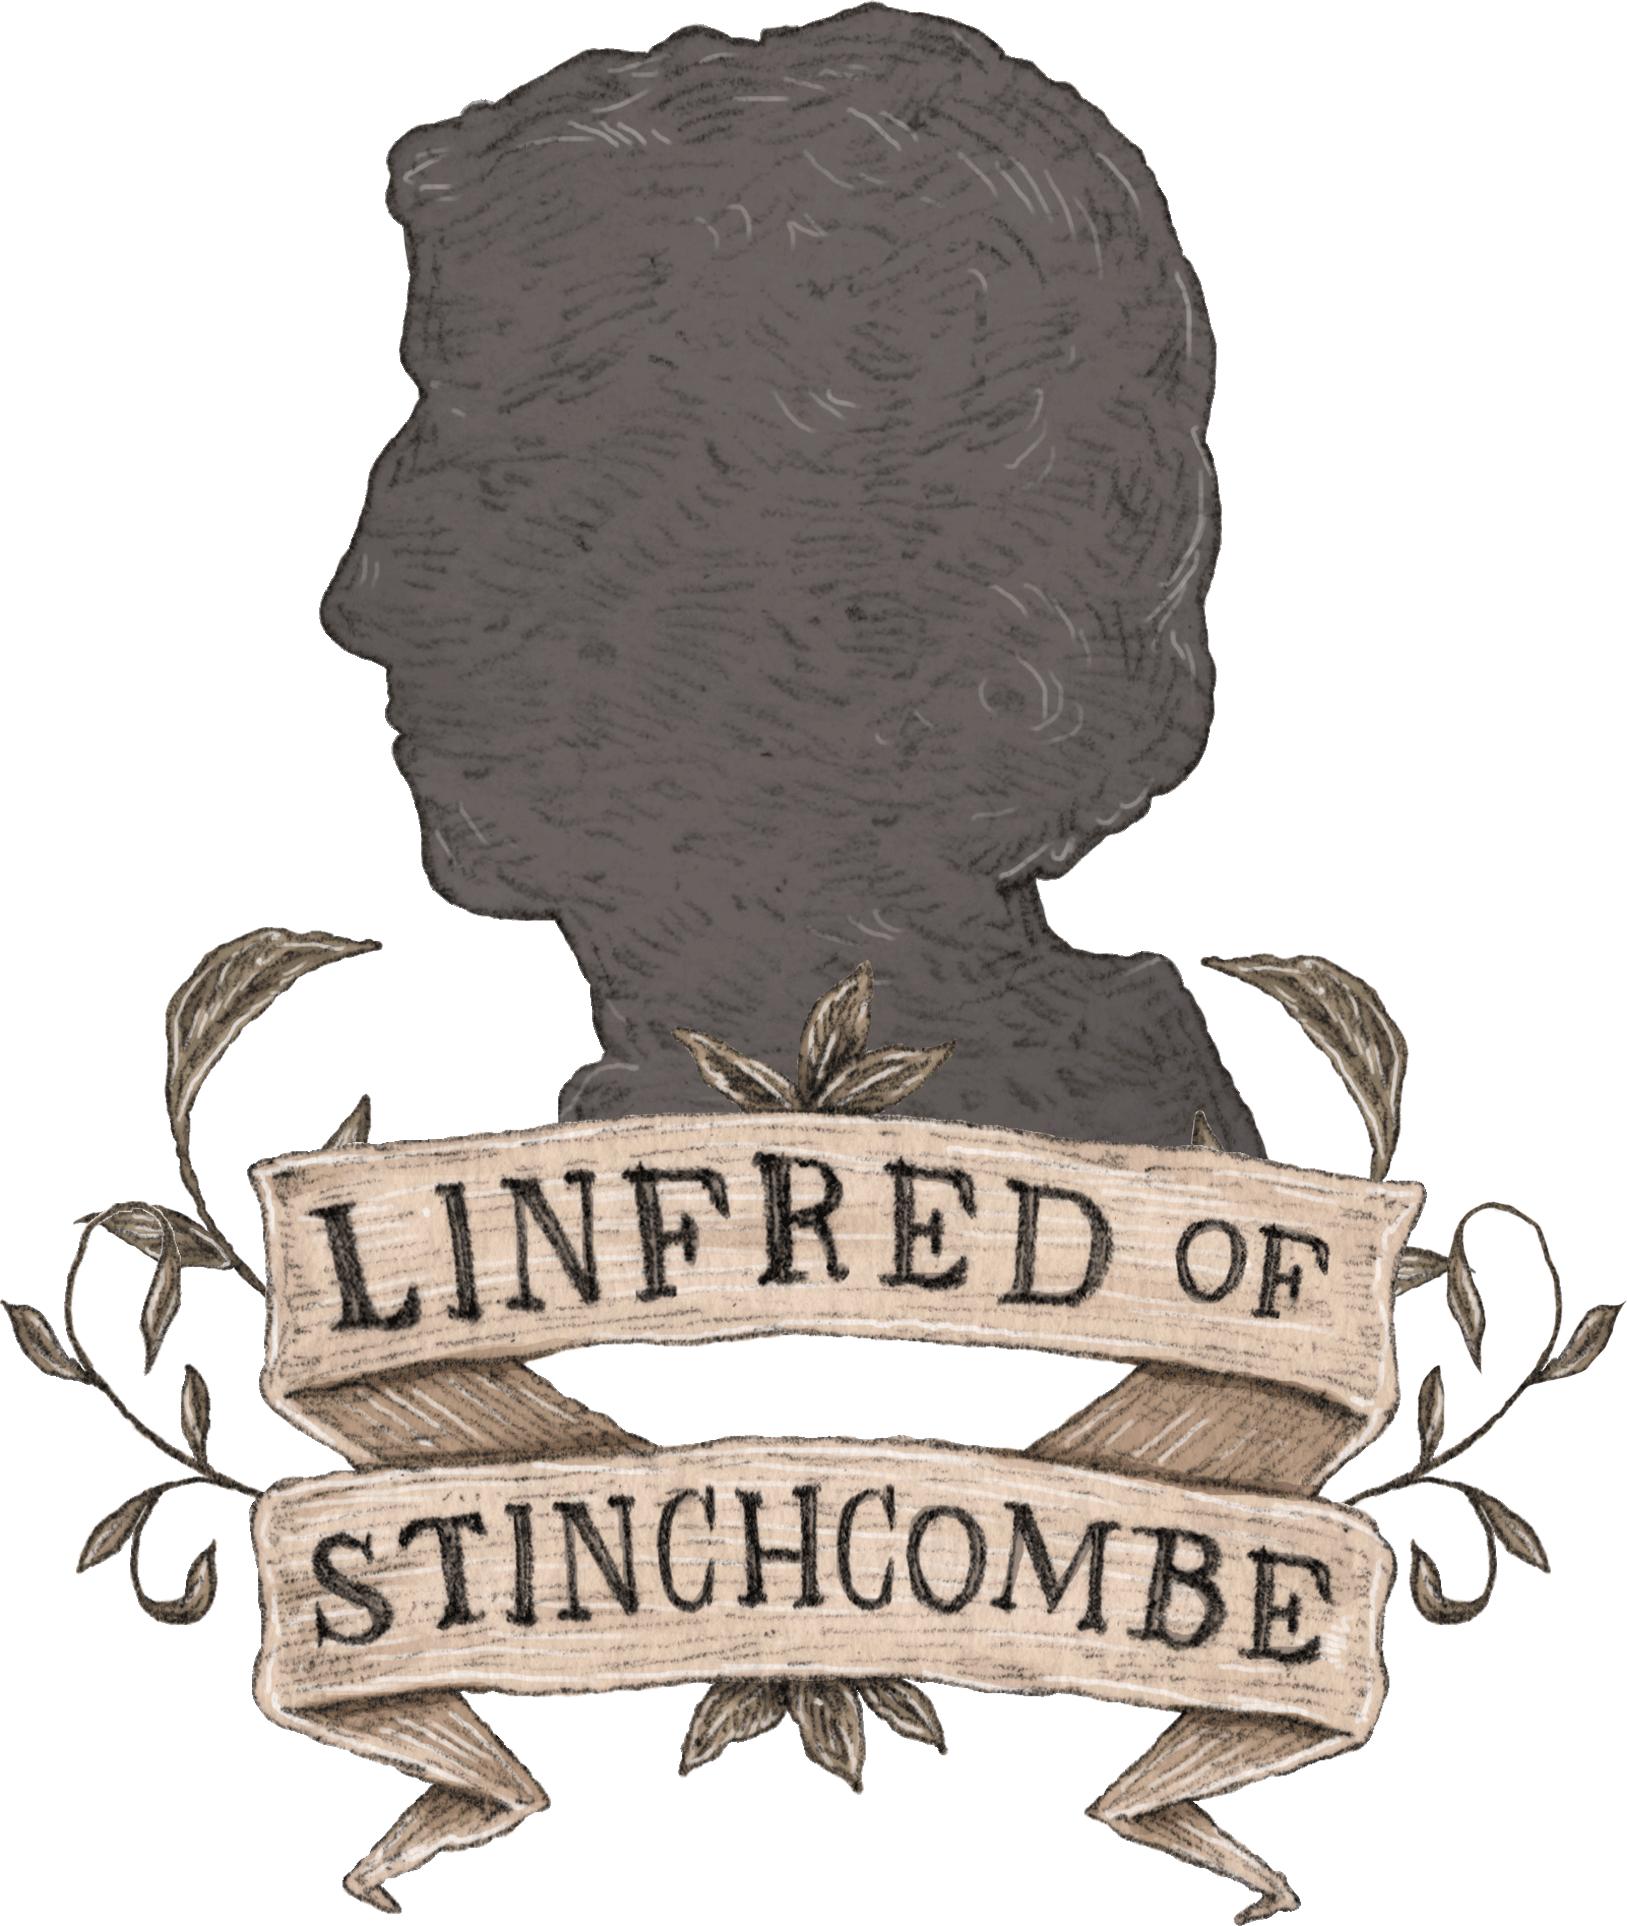 Linfred of Stinchcombe